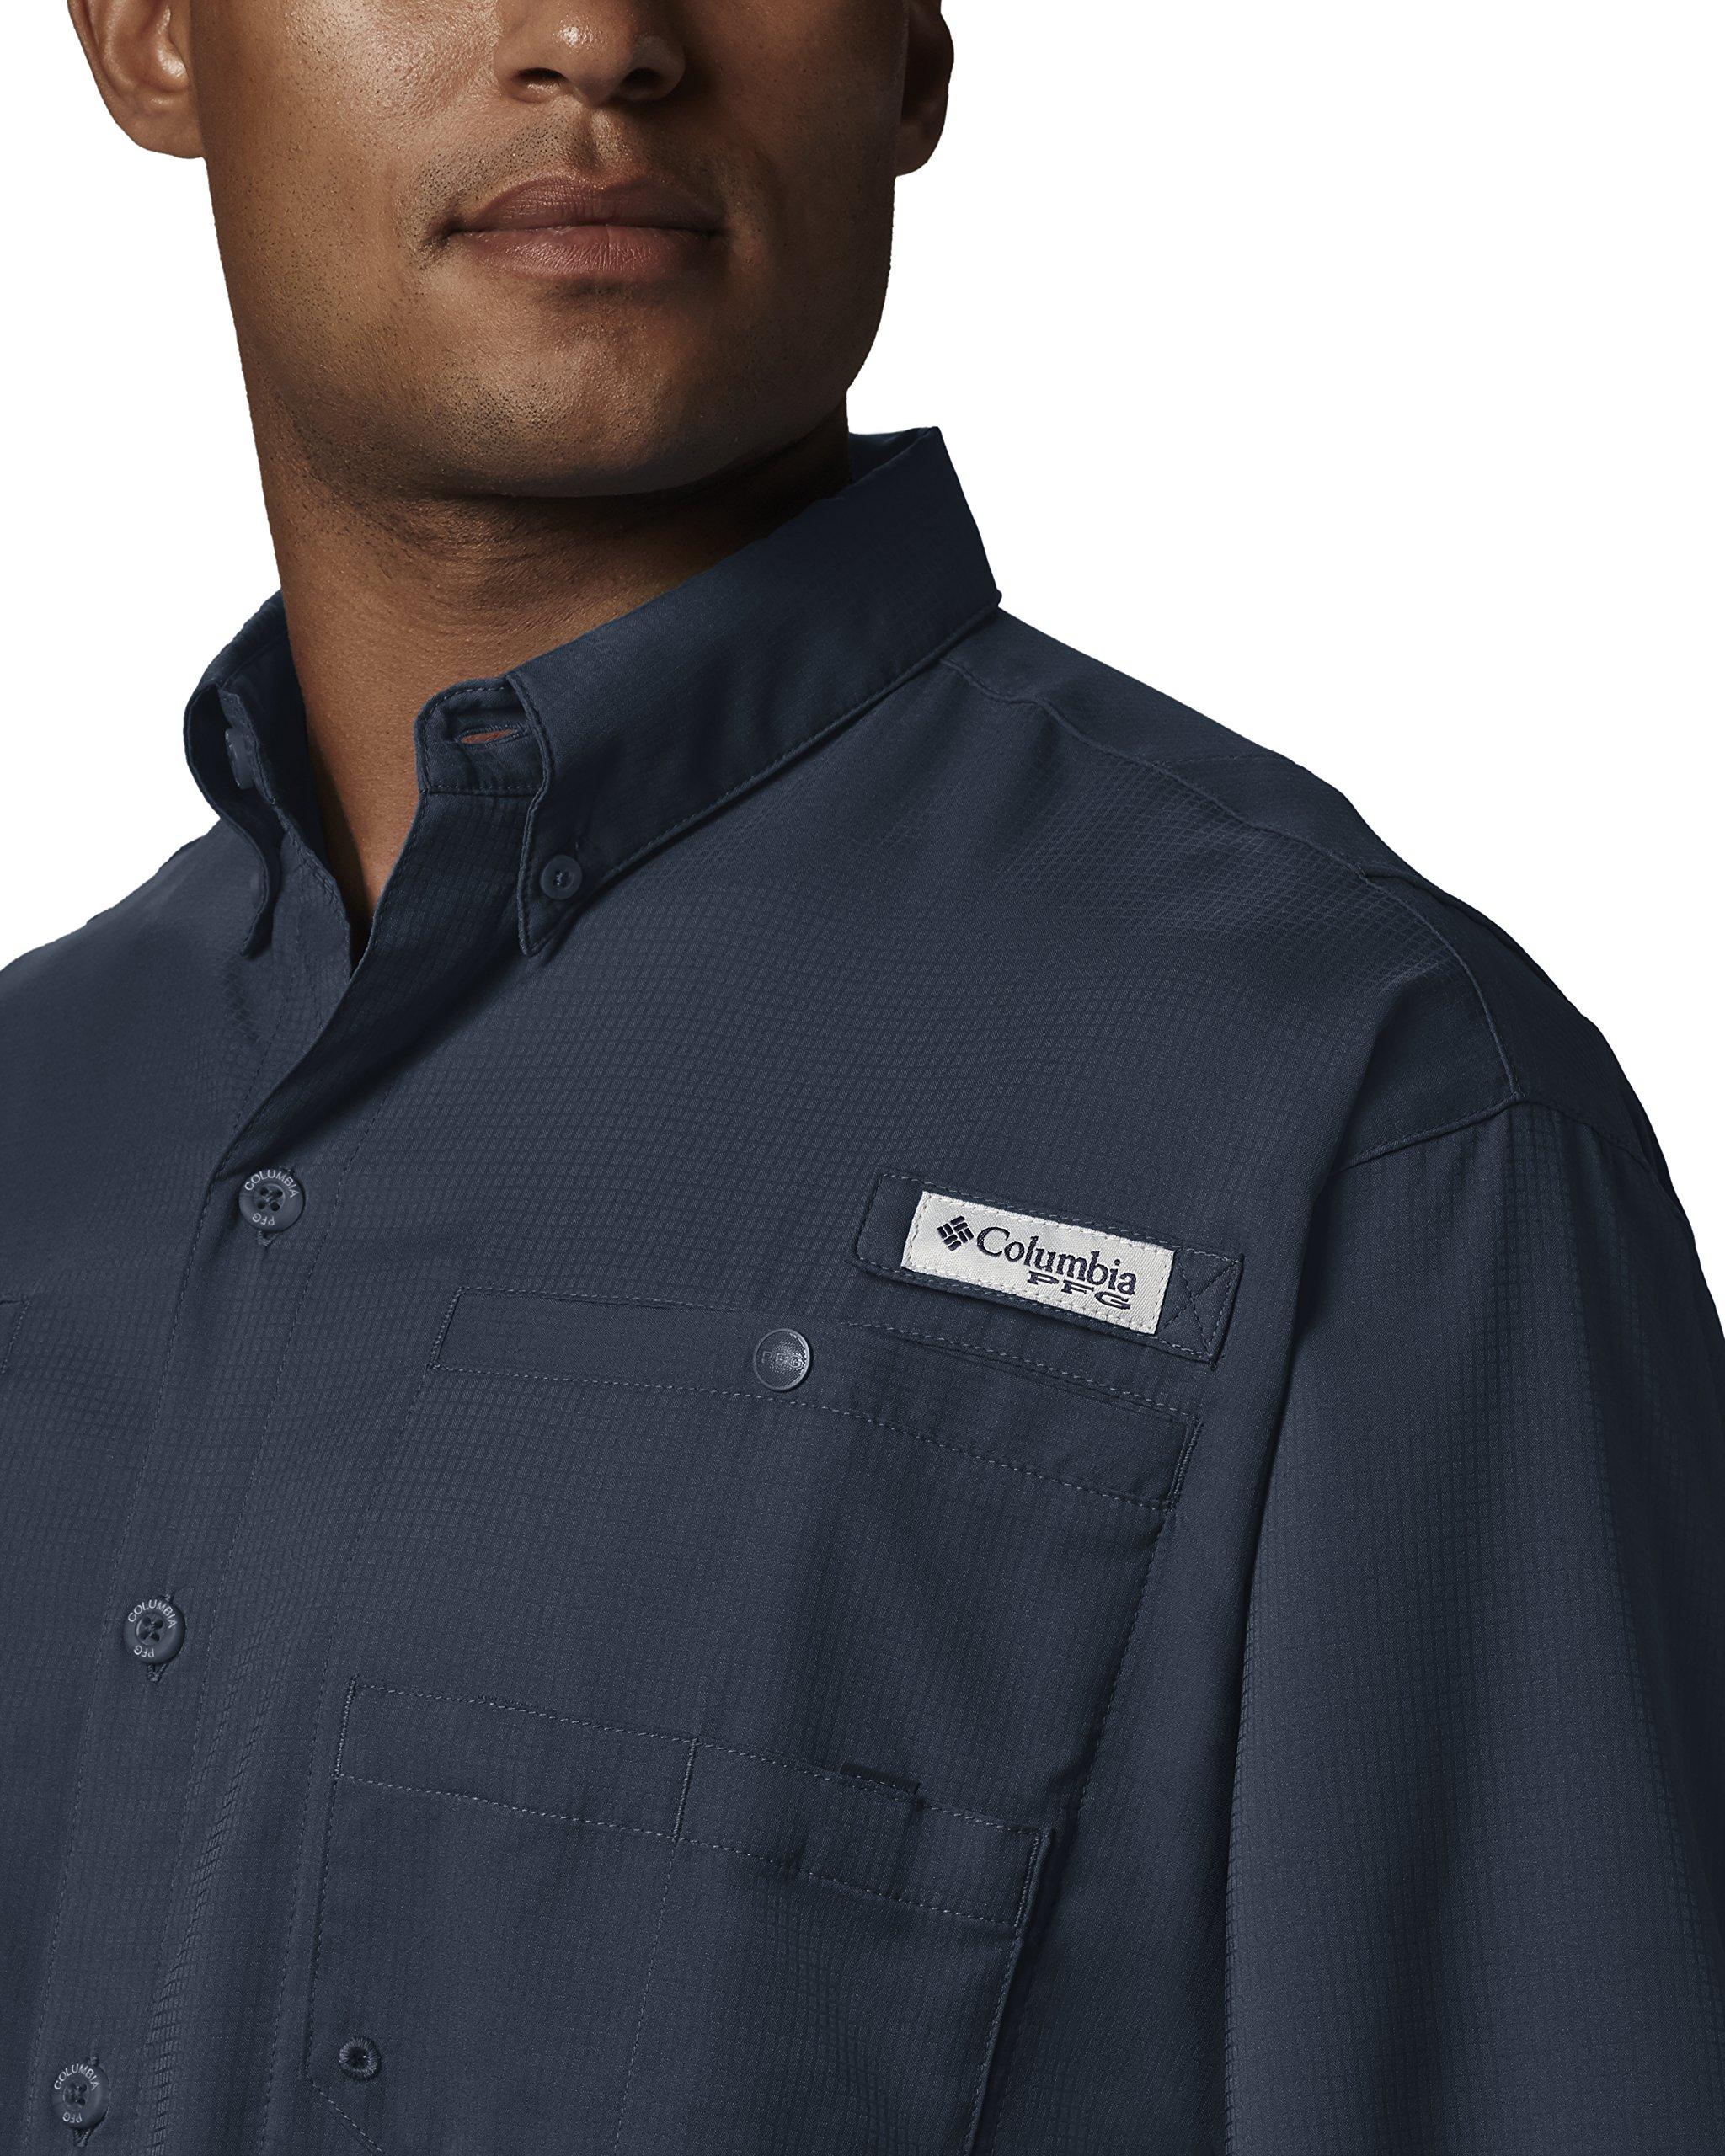 Columbia Men's Tamiami II Short Sleeve Fishing Shirt, Collegiate Navy, X-Small by Columbia (Image #3)